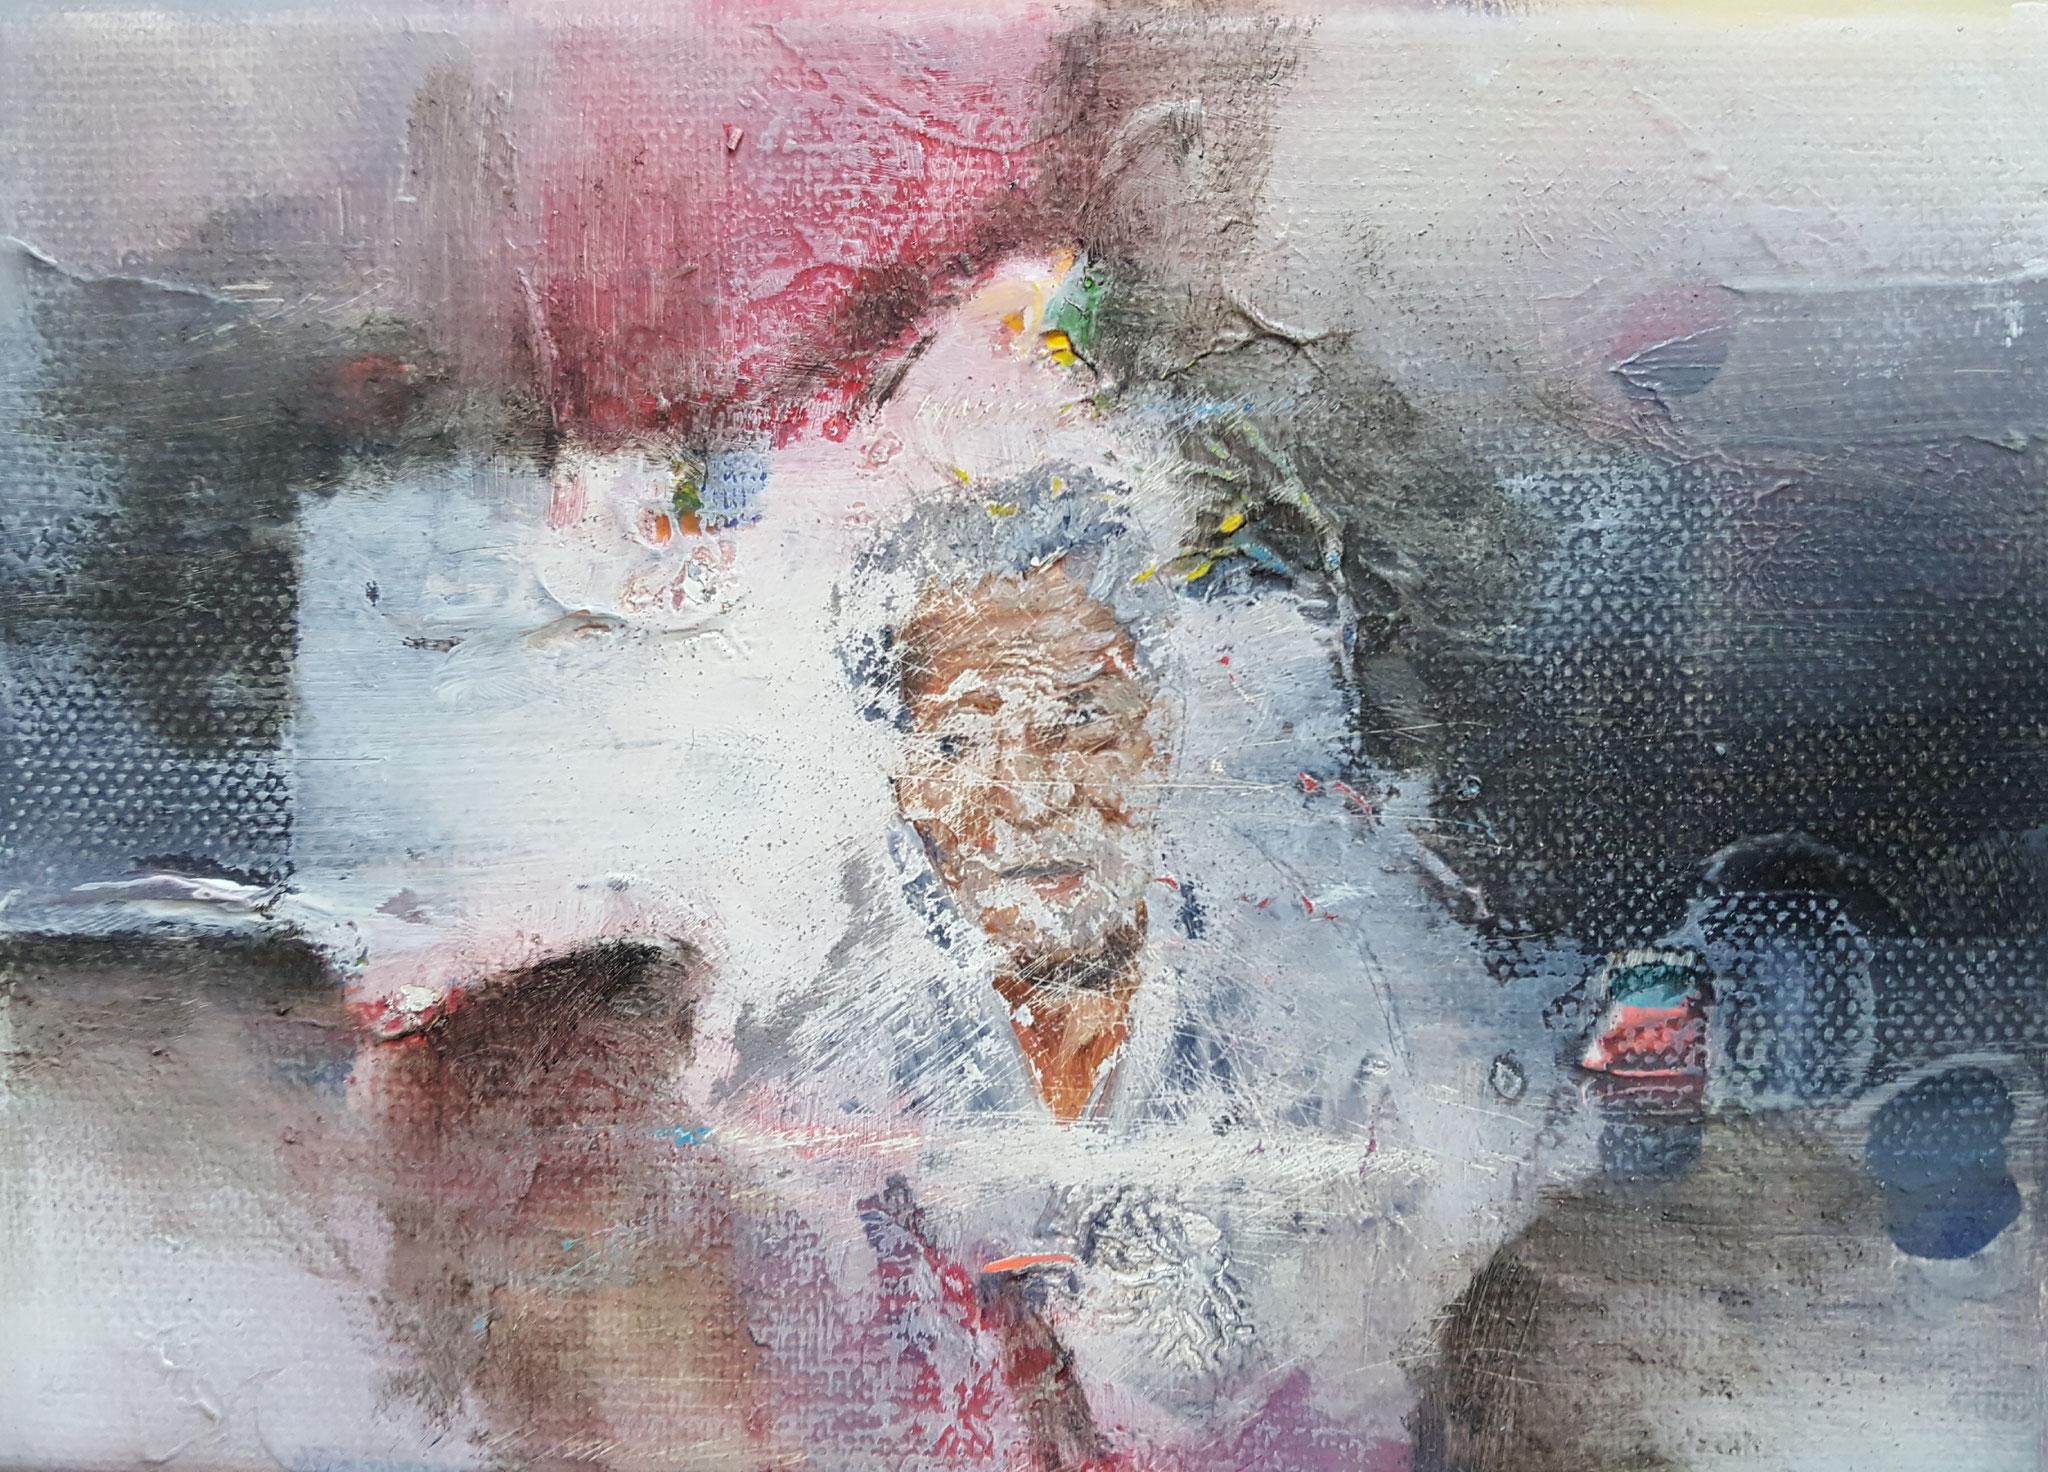 Des-aparecidos I, 2018, 18 x 13 cm, Mixed media on canvas